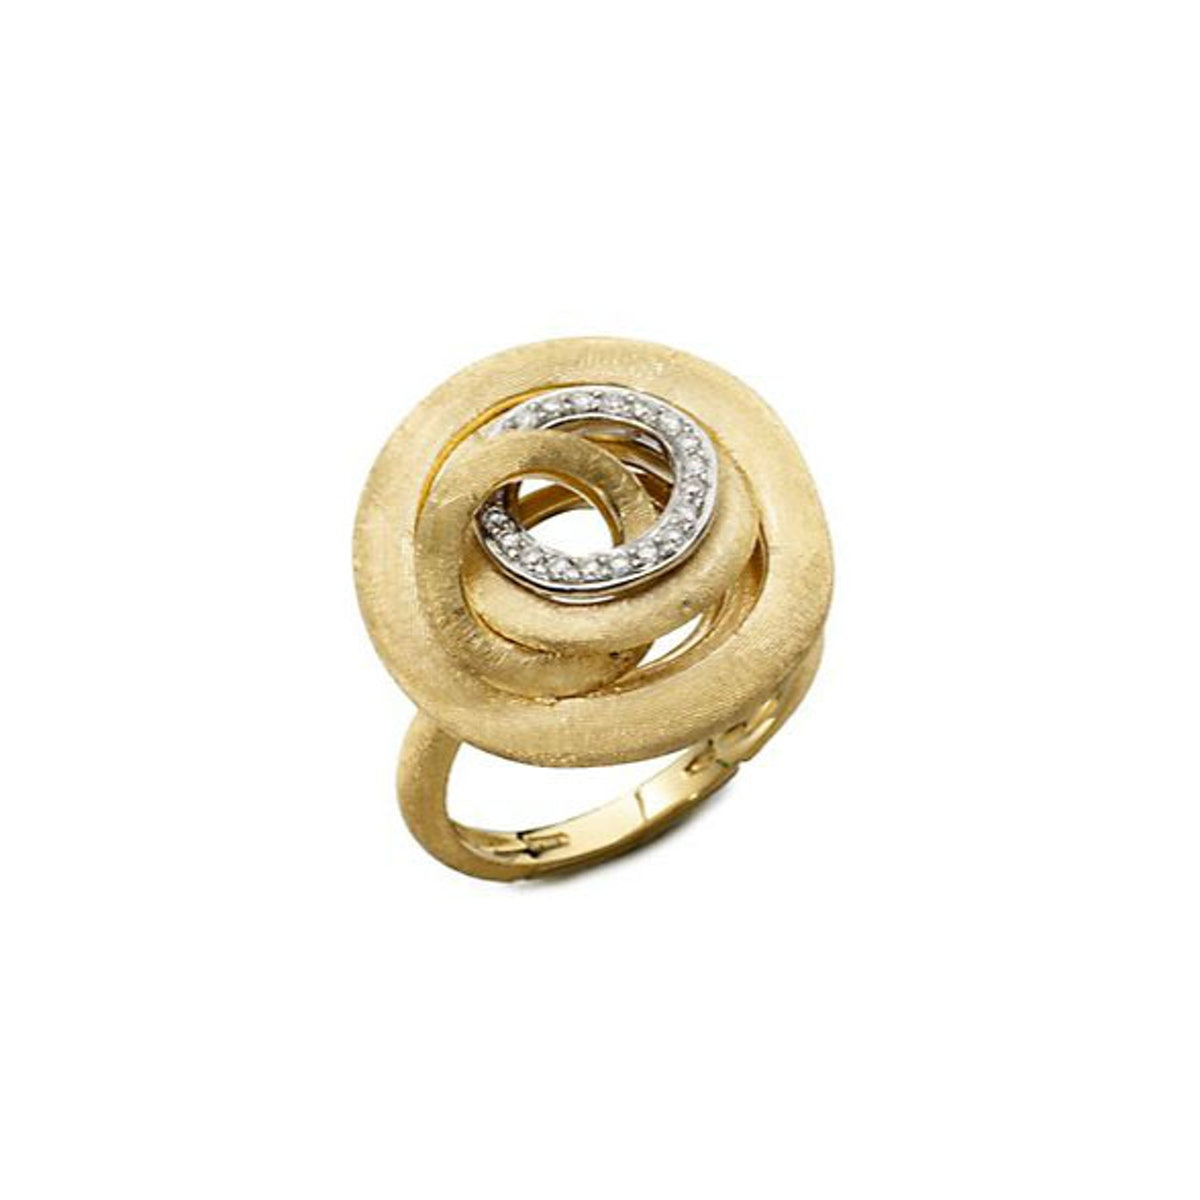 Marco Bicego ring